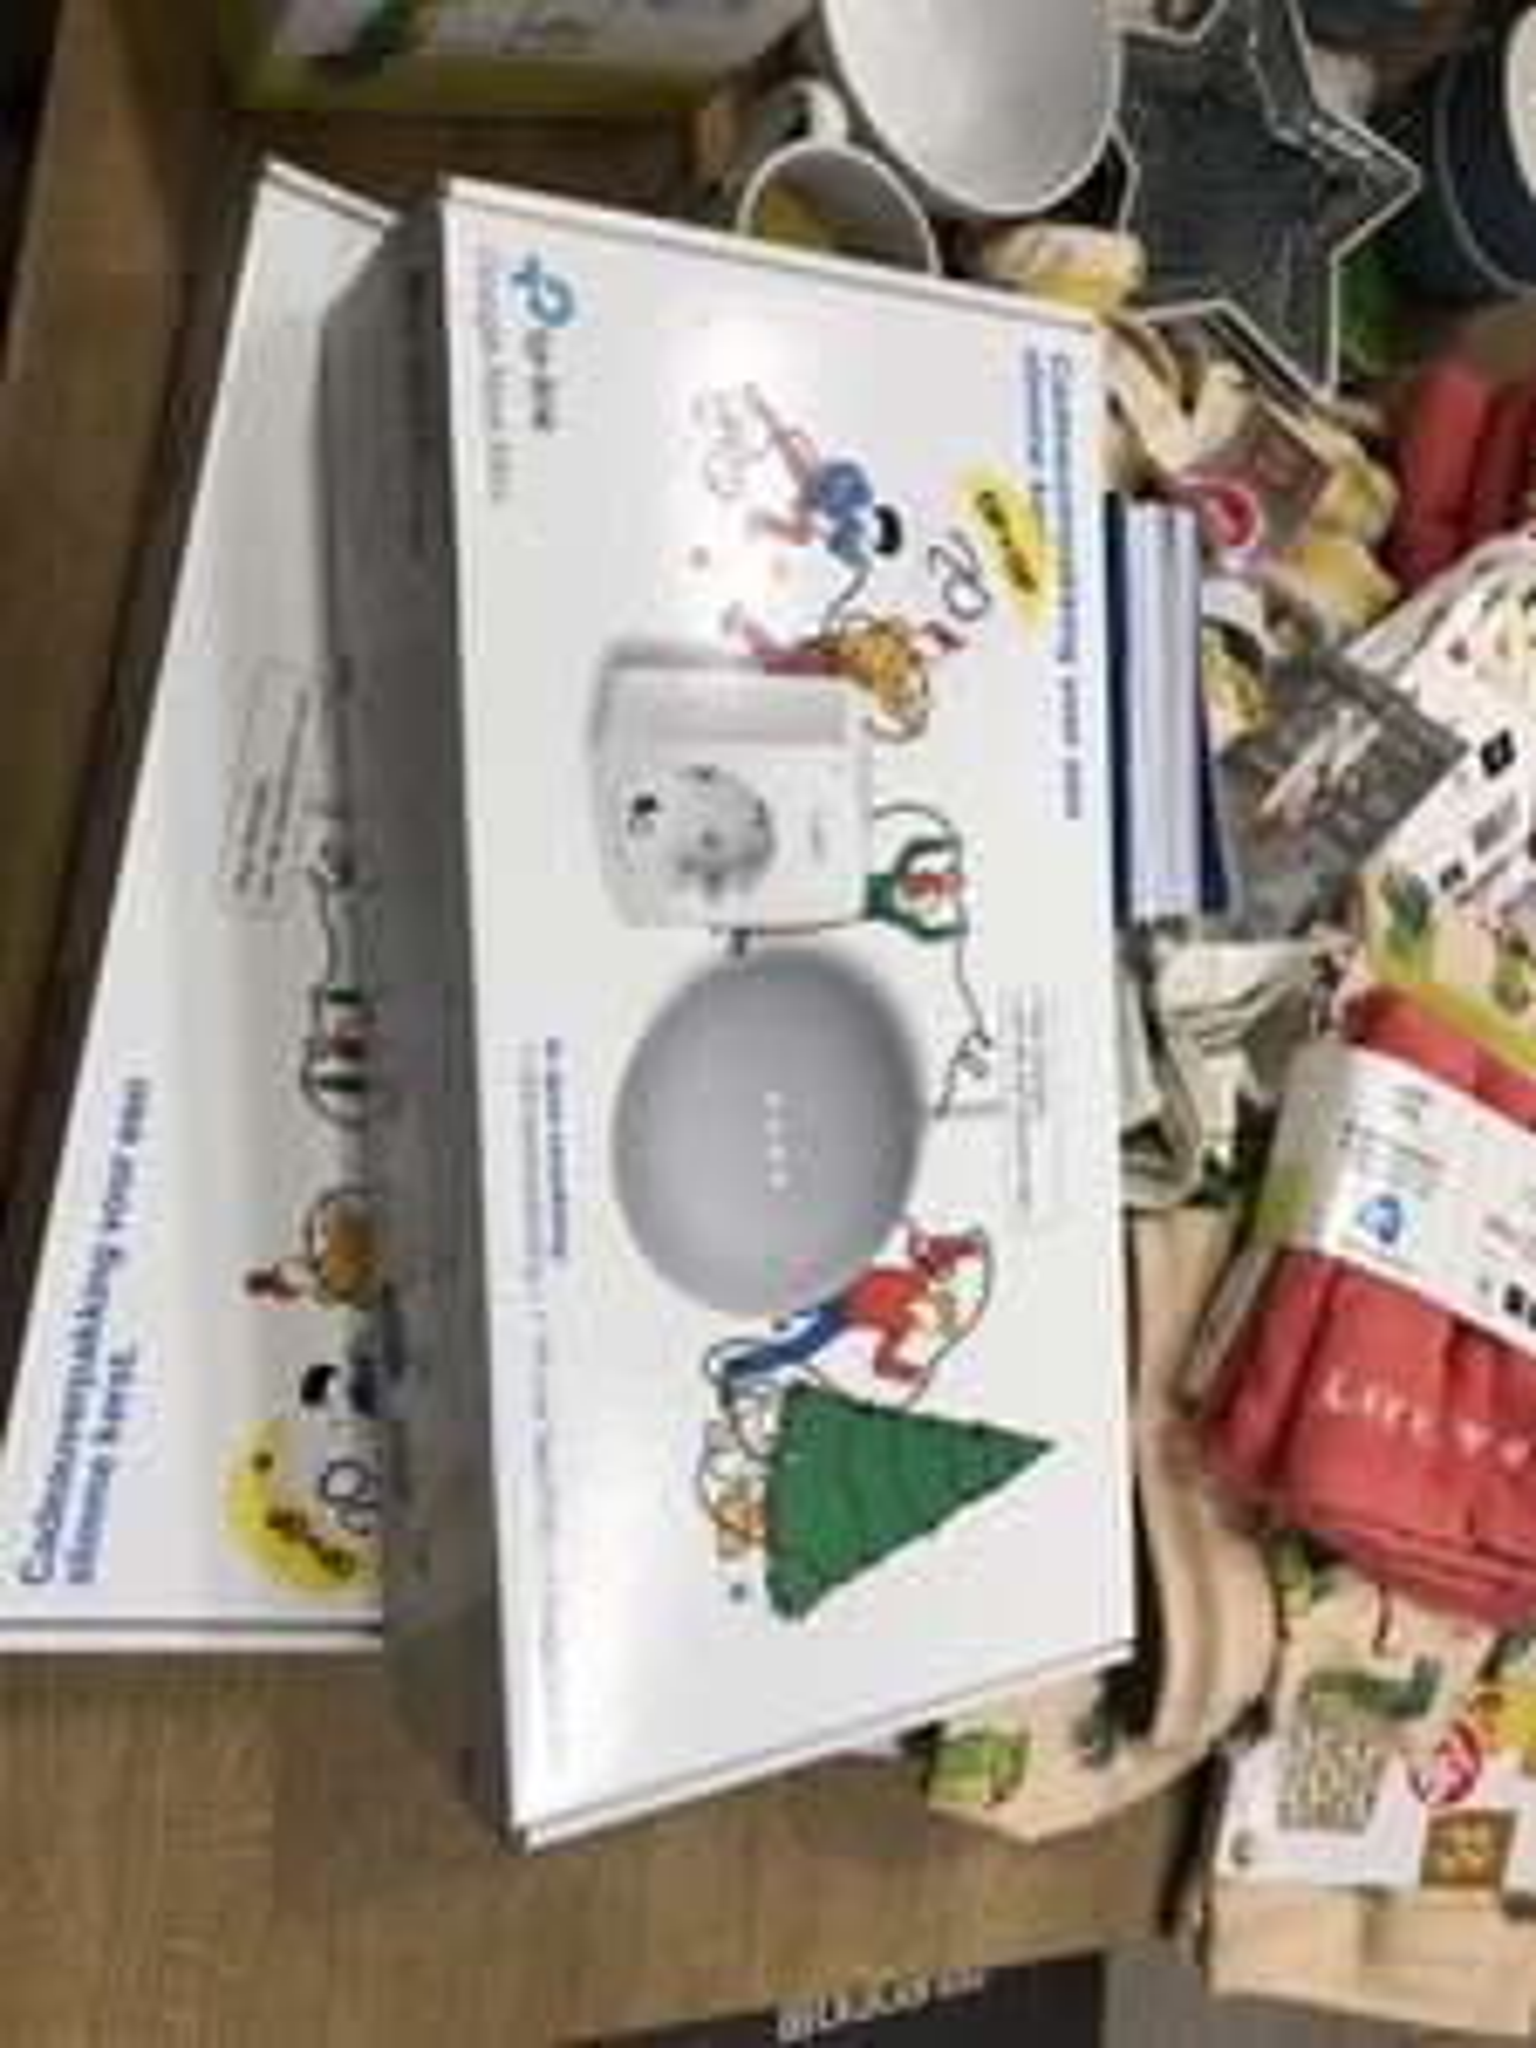 (Lokaal Oudenbosch) Google Nest mini + smart plug + kerstverlichting